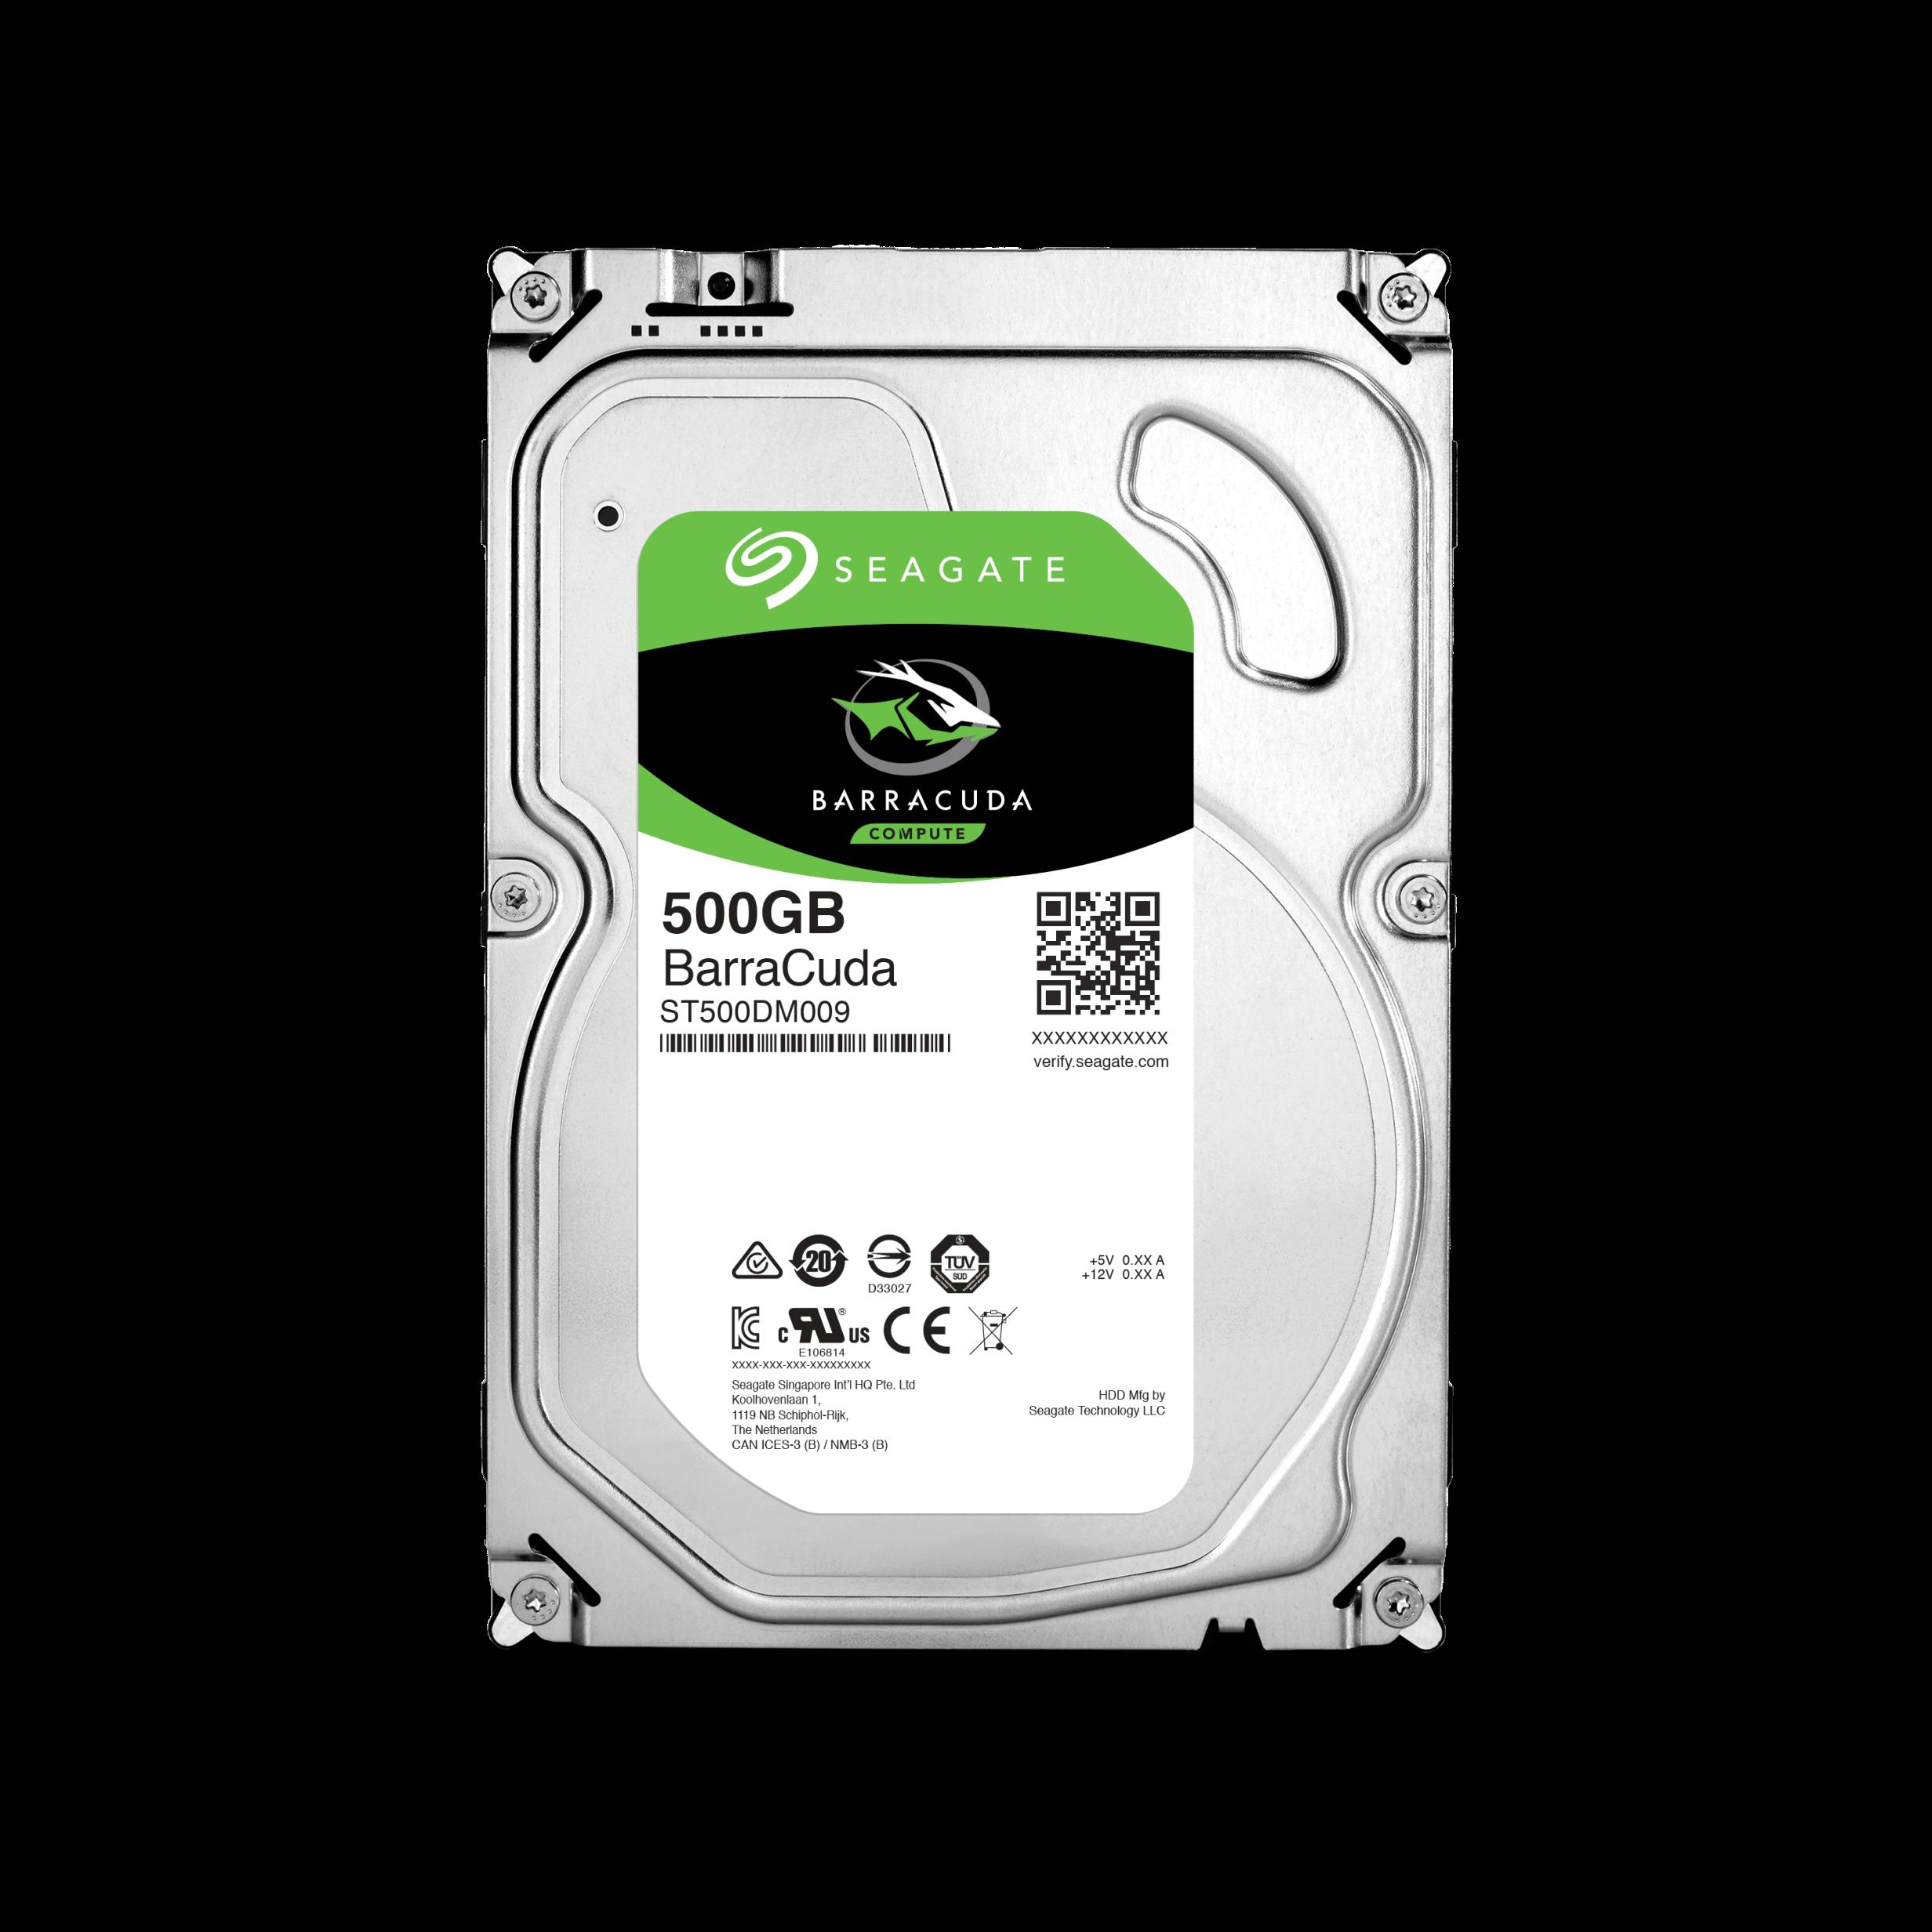 "Seagate BarraCuda 3.5"" HDD, 500GB, 3.5"", SATAIII, 32MB cache, 7.200RPM"